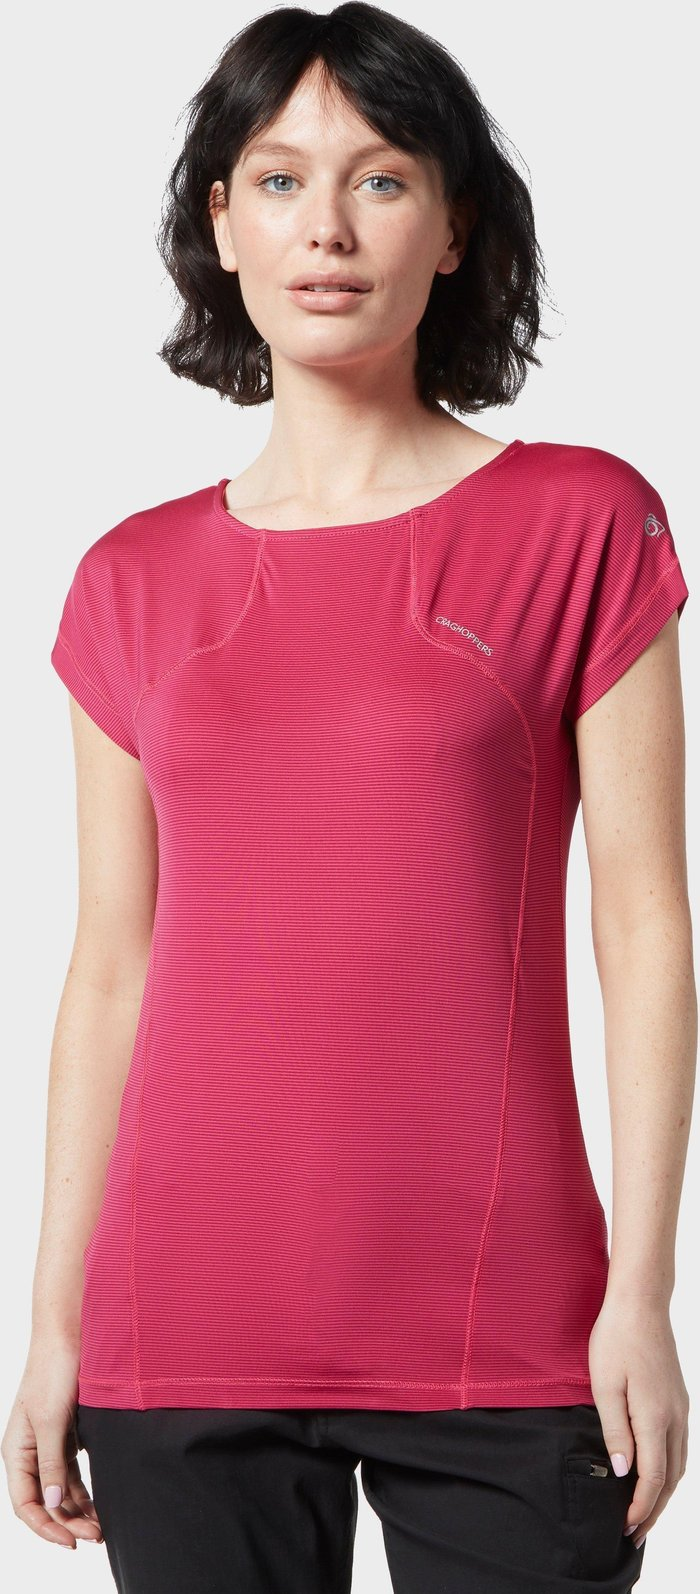 Craghoppers Women's Fusion T-Shirt, Pink/PNK